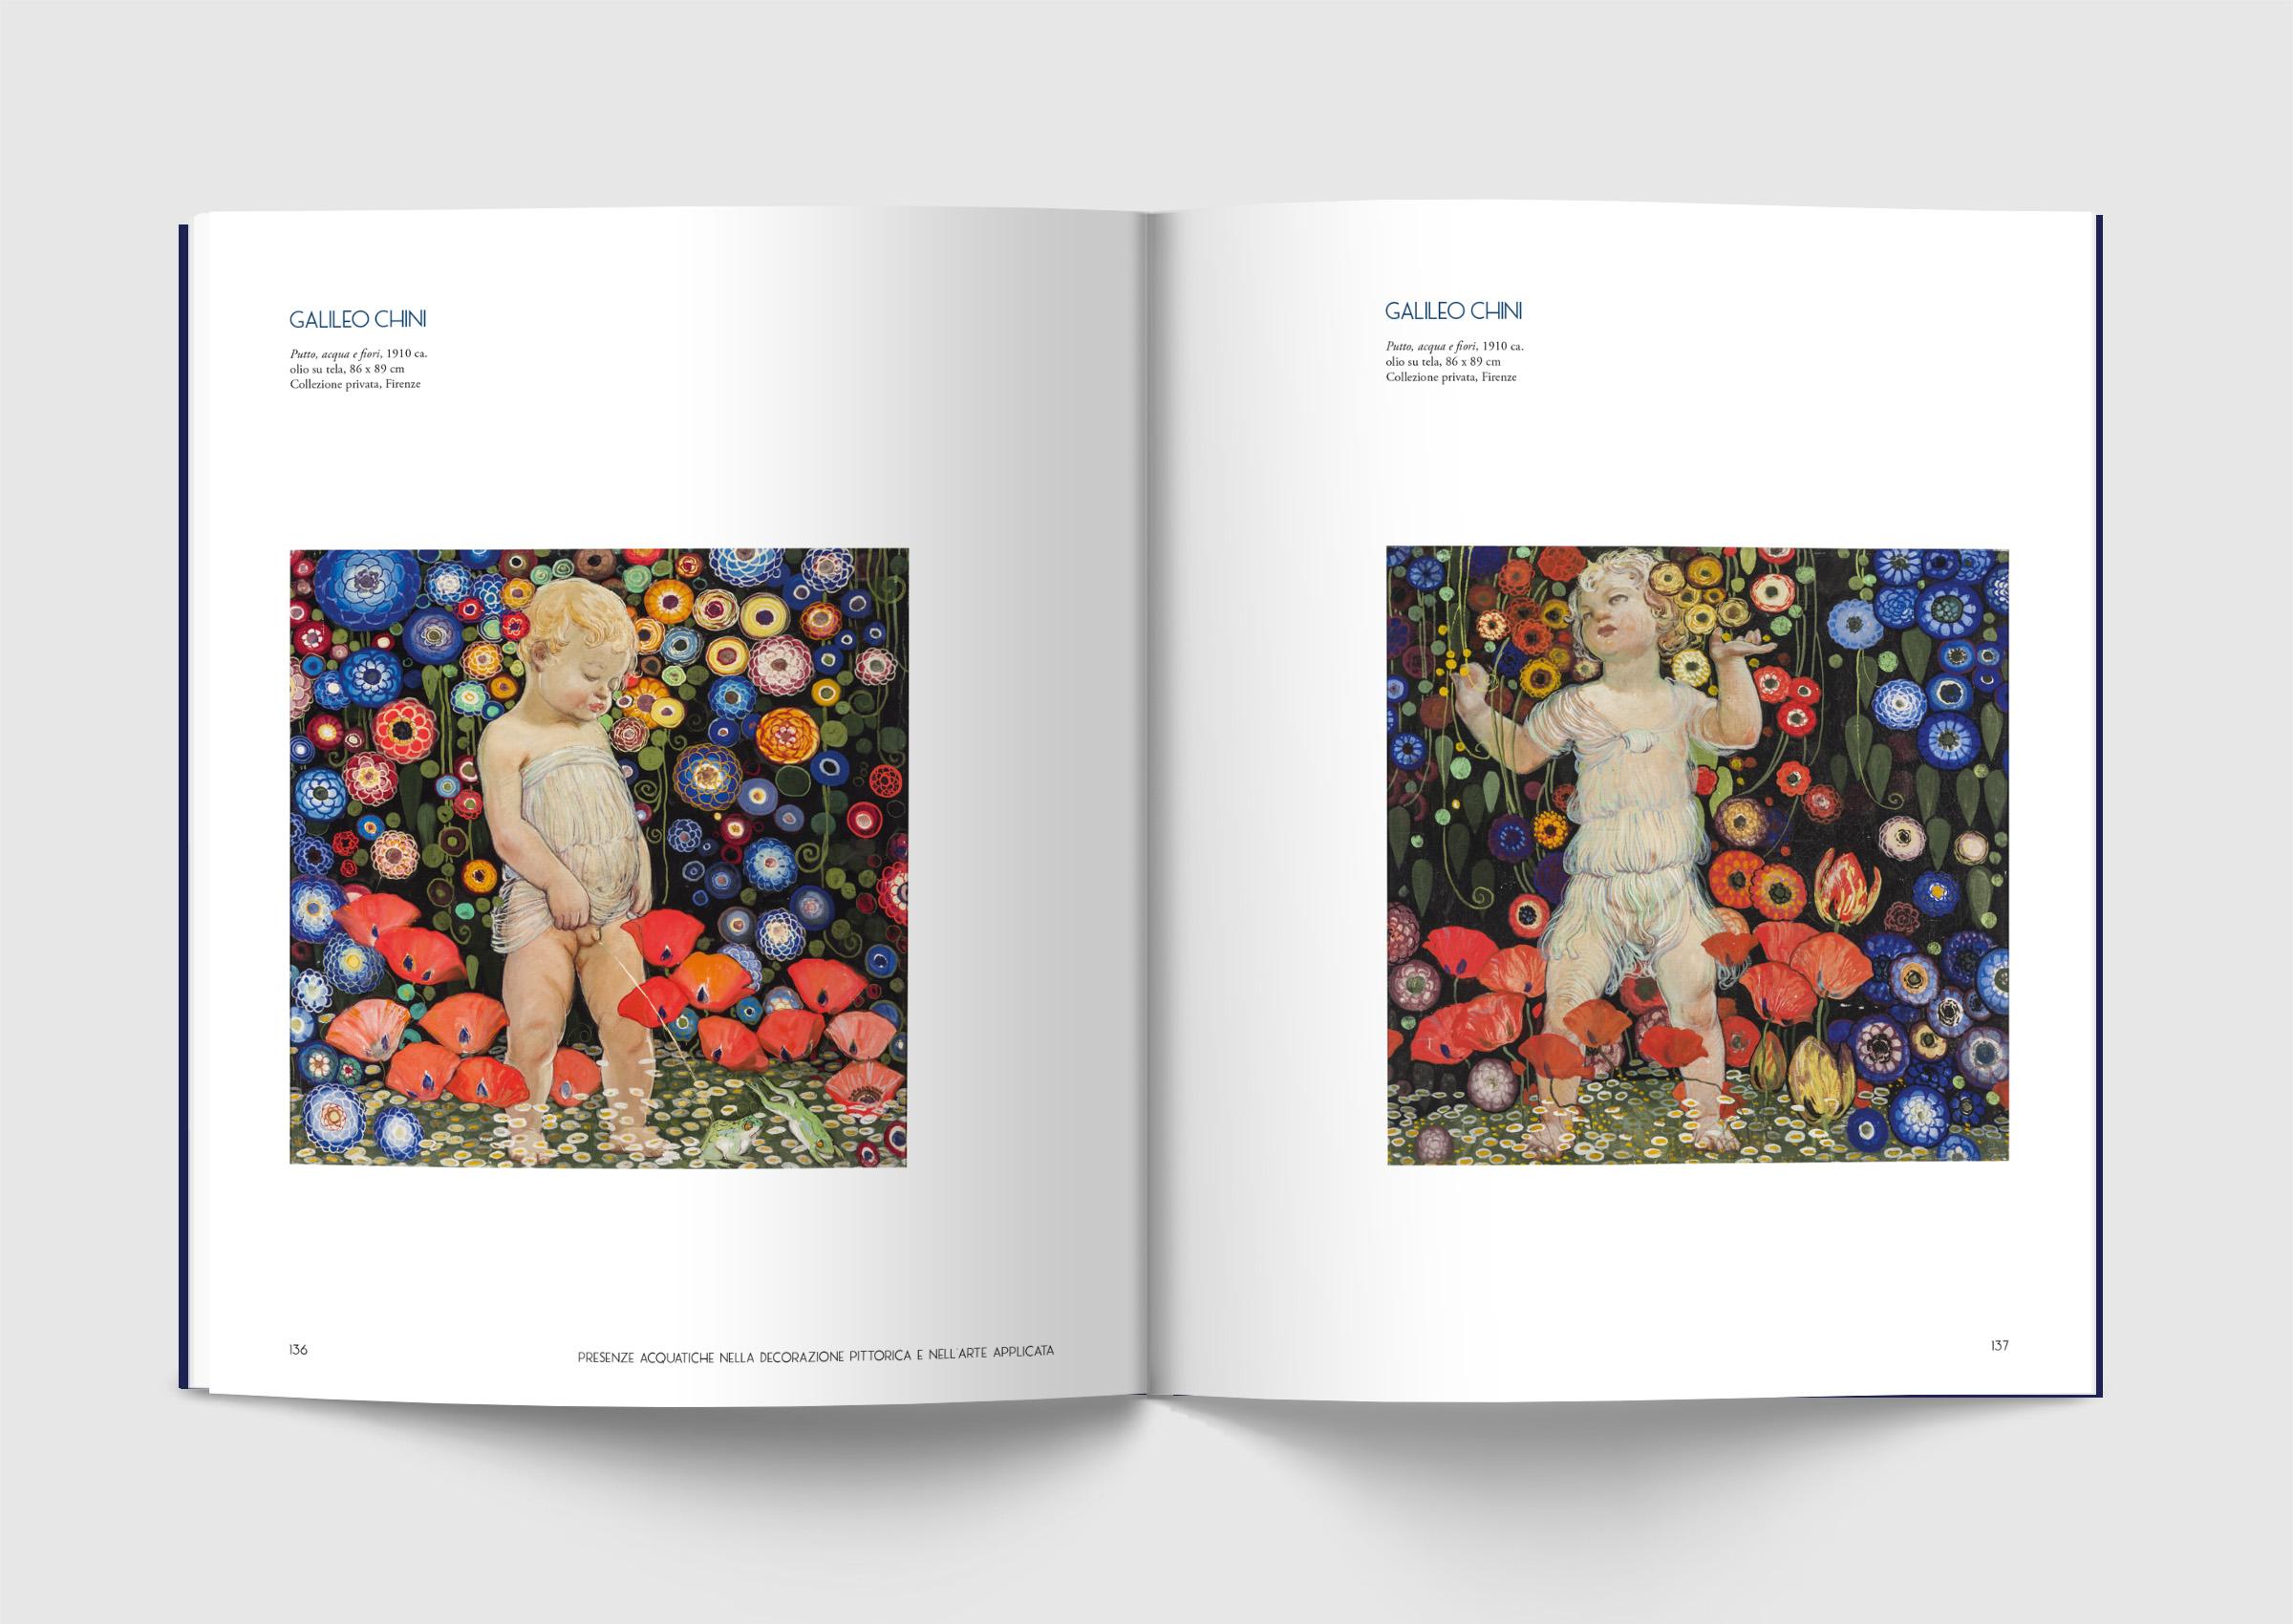 Catalogo Mostra, Galileo Chini, Palp, Pontedera, Design Deferrari modesti